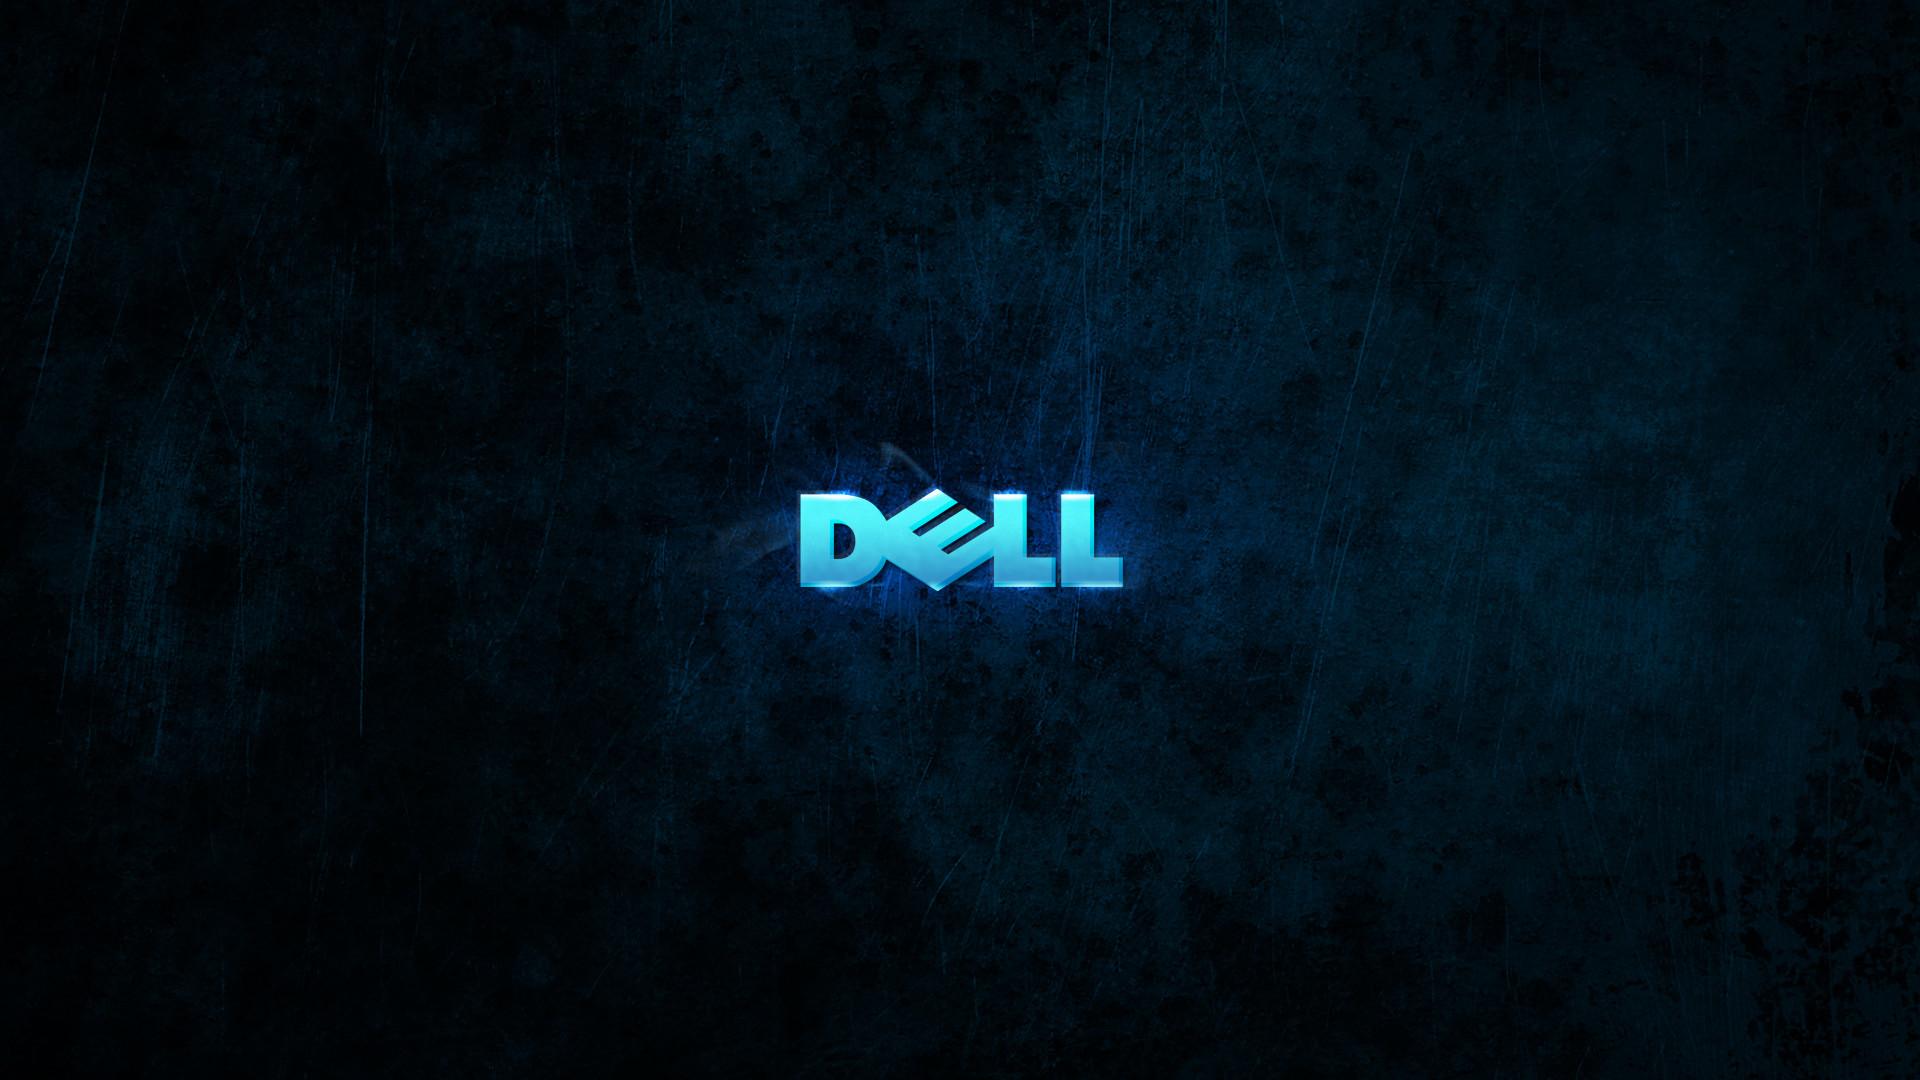 Alienware Logo Hd Wallpaper Dell Windows 7 Desktop Wallpaper 63 Images